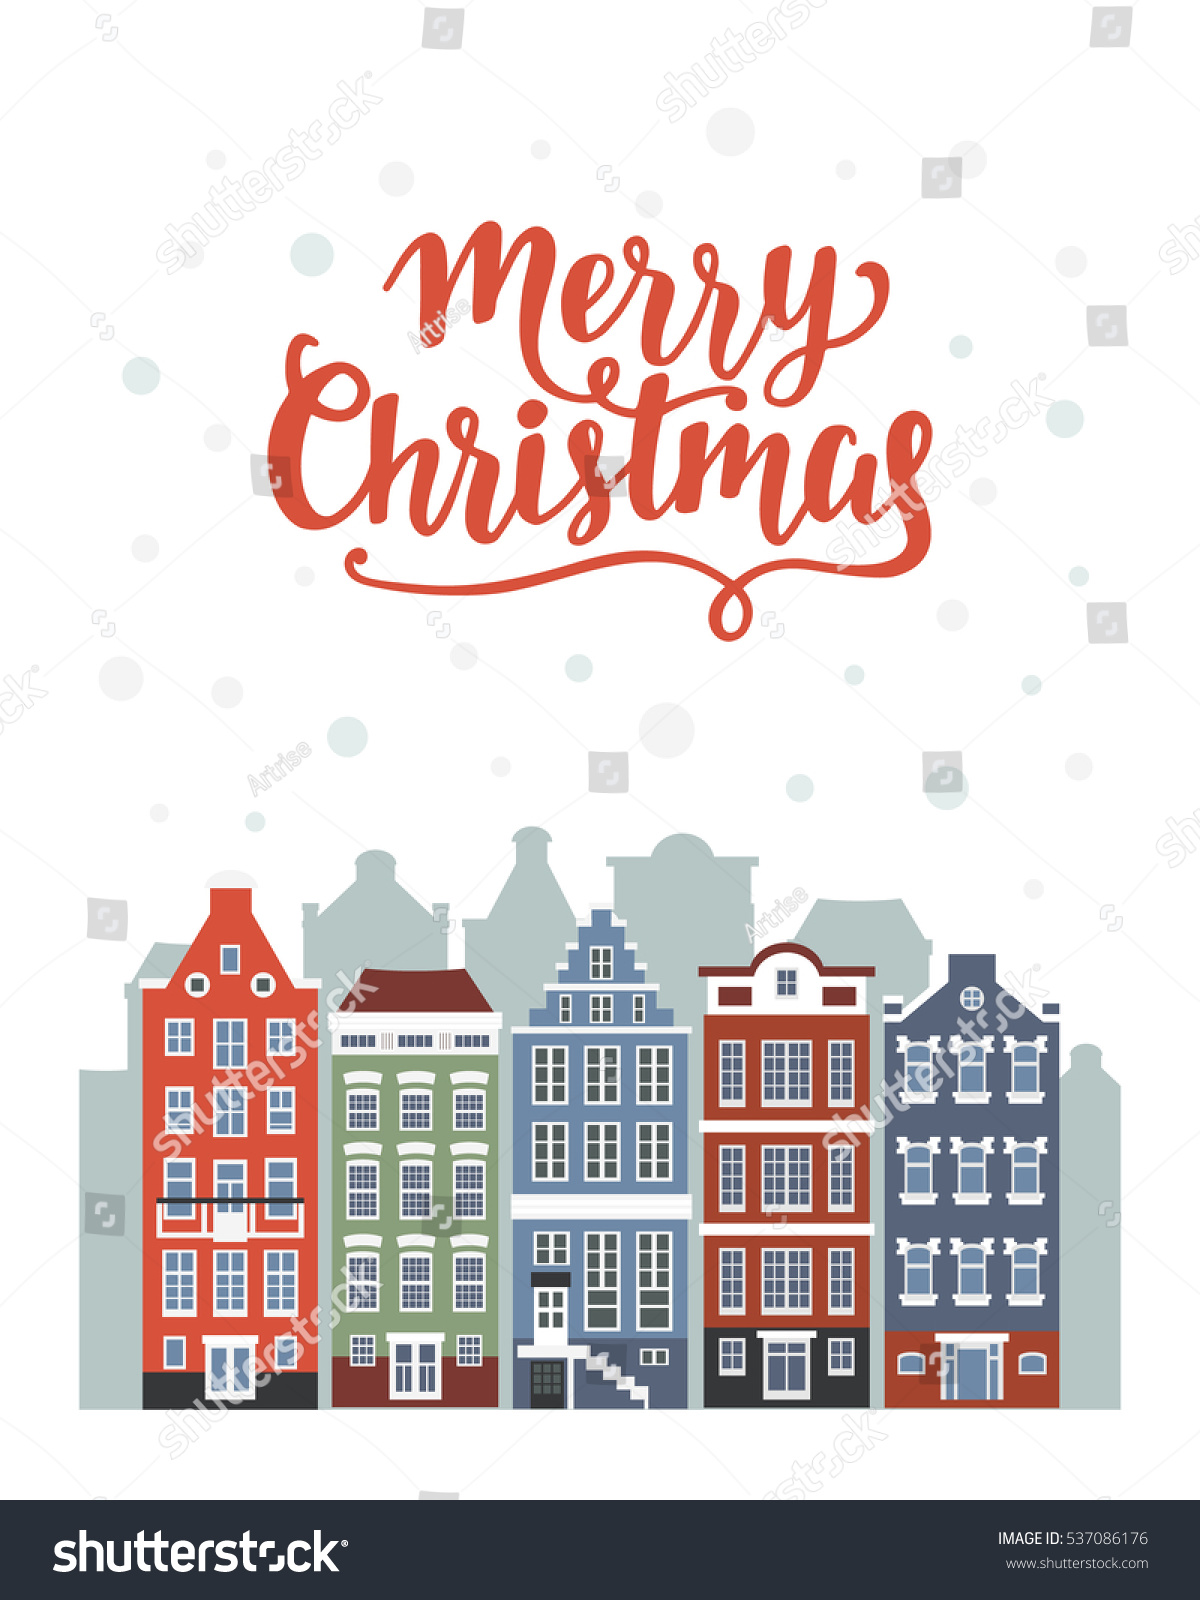 Merry christmas greeting card winter amsterdam stock illustration merry christmas greeting card with winter amsterdam houses vintage card illustration m4hsunfo